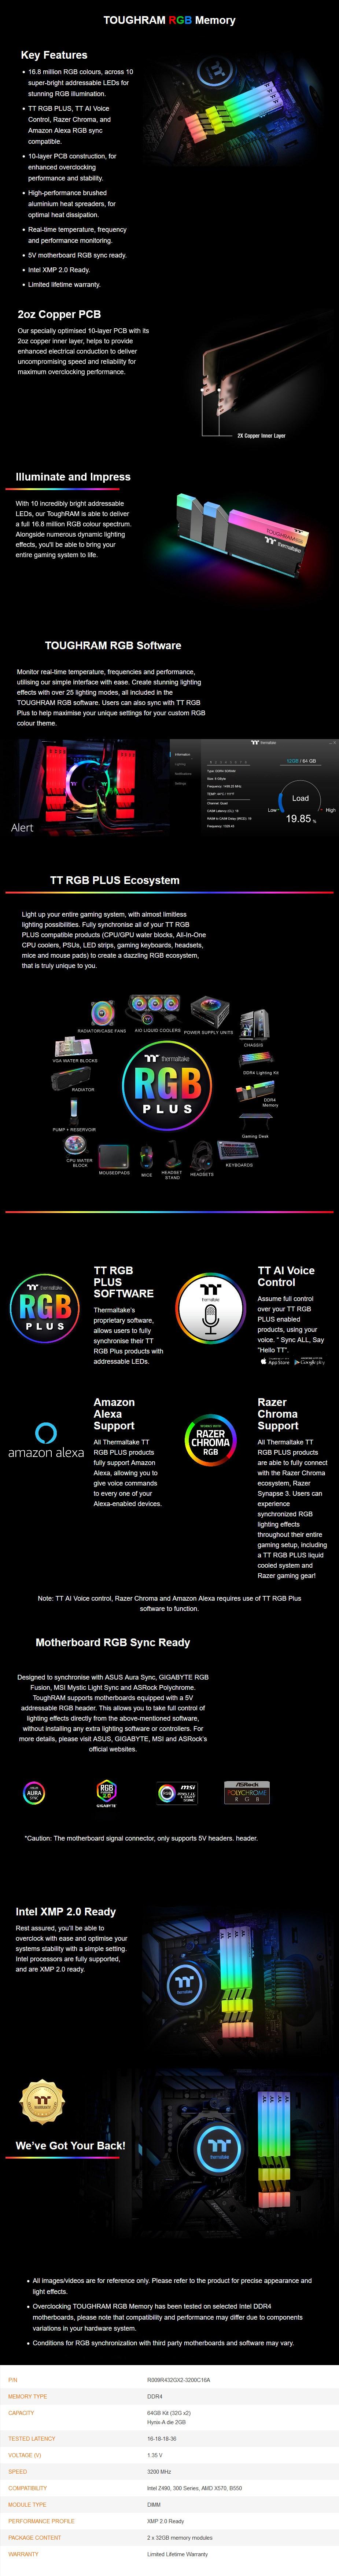 Thermaltake TOUGHRAM RGB 64GB (2x32GB) DDR4 3200MHz CL16 Memory - Black - Overview 1